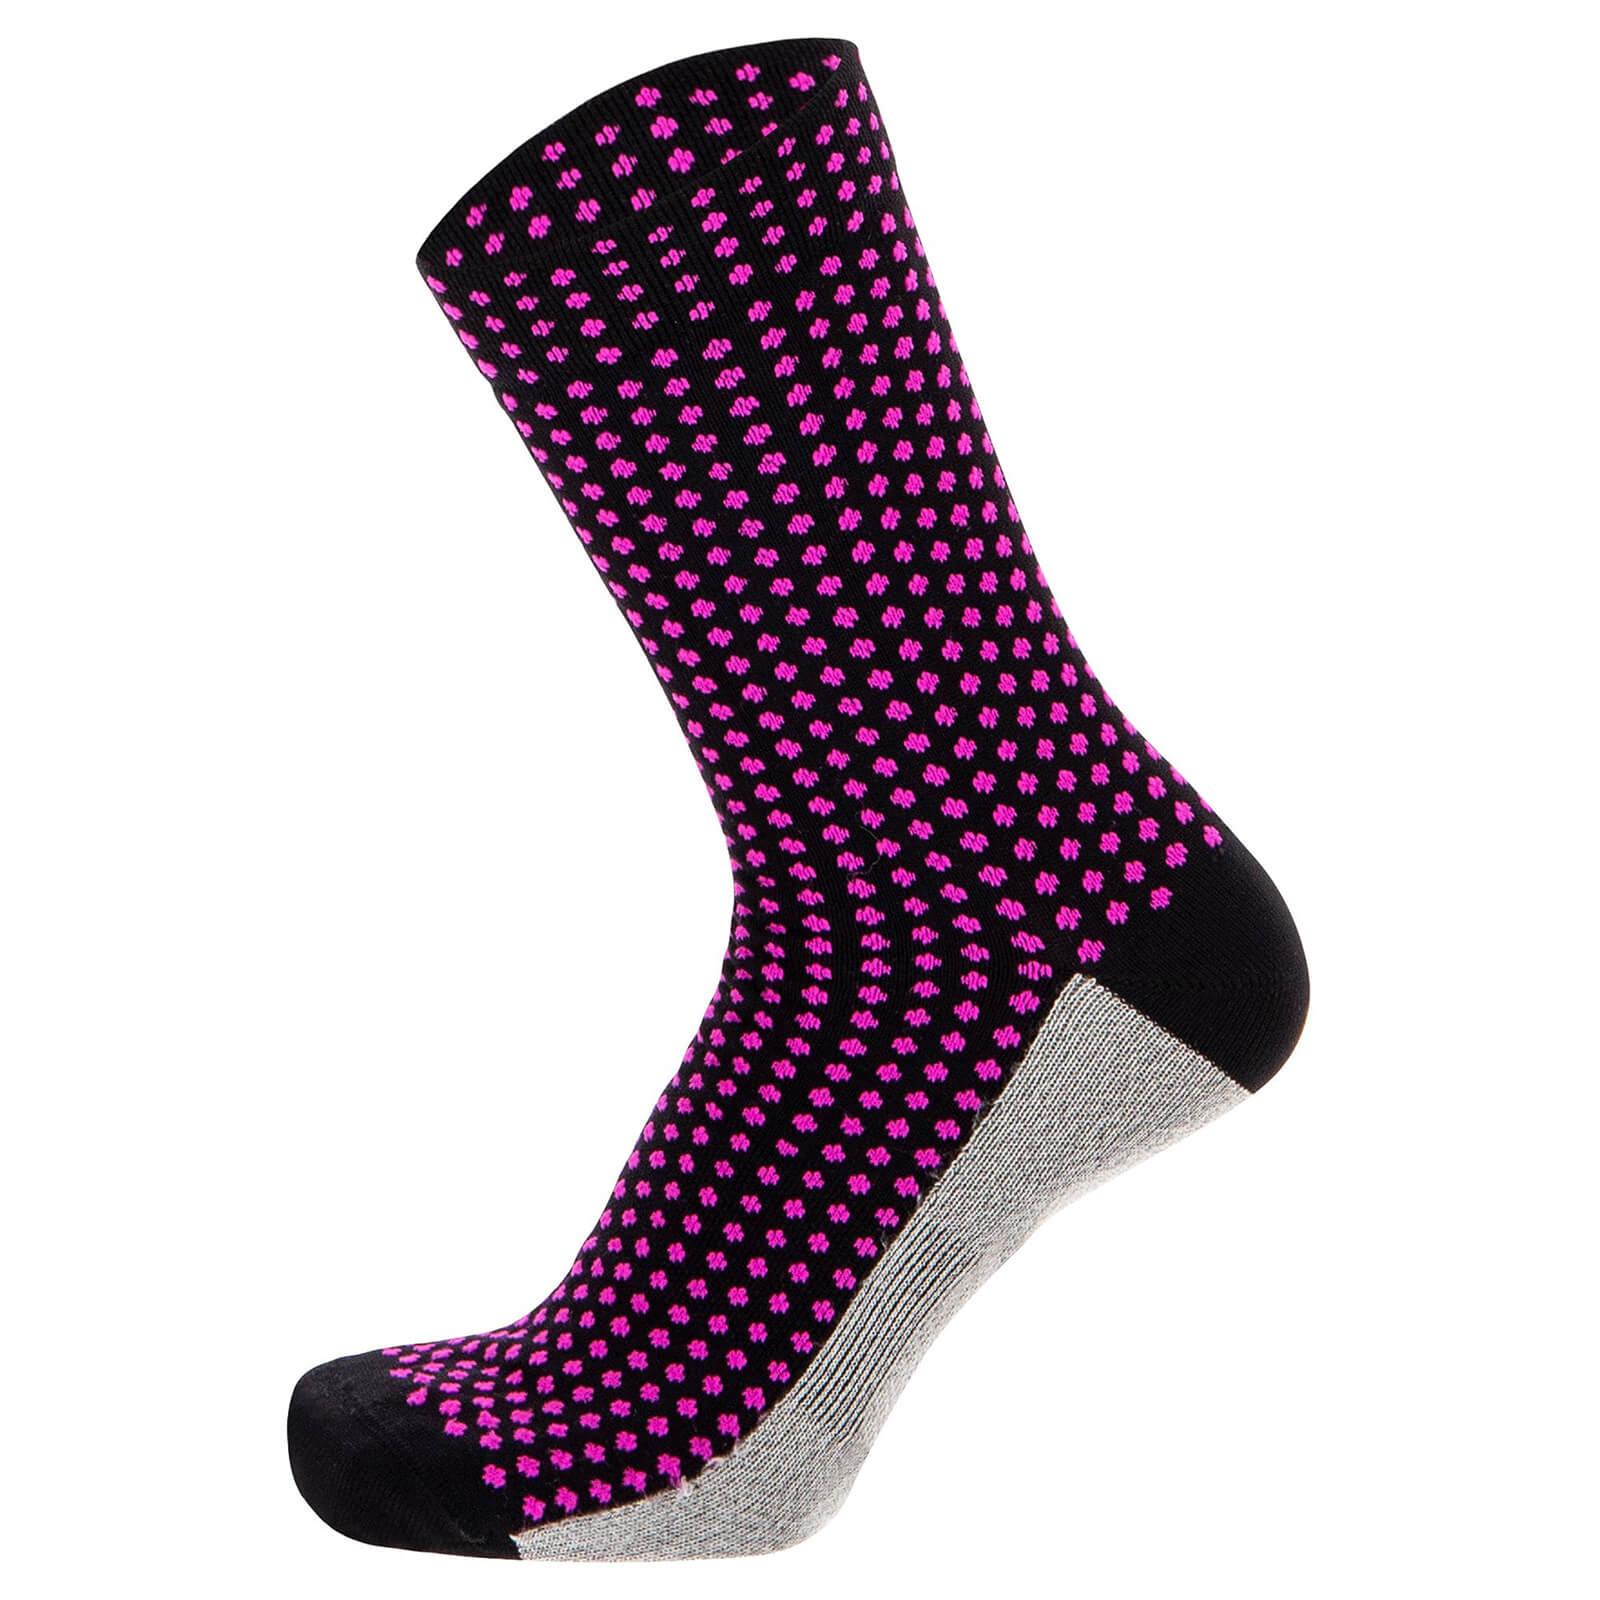 Santini Medium Profile Socks - XS - Schwarz